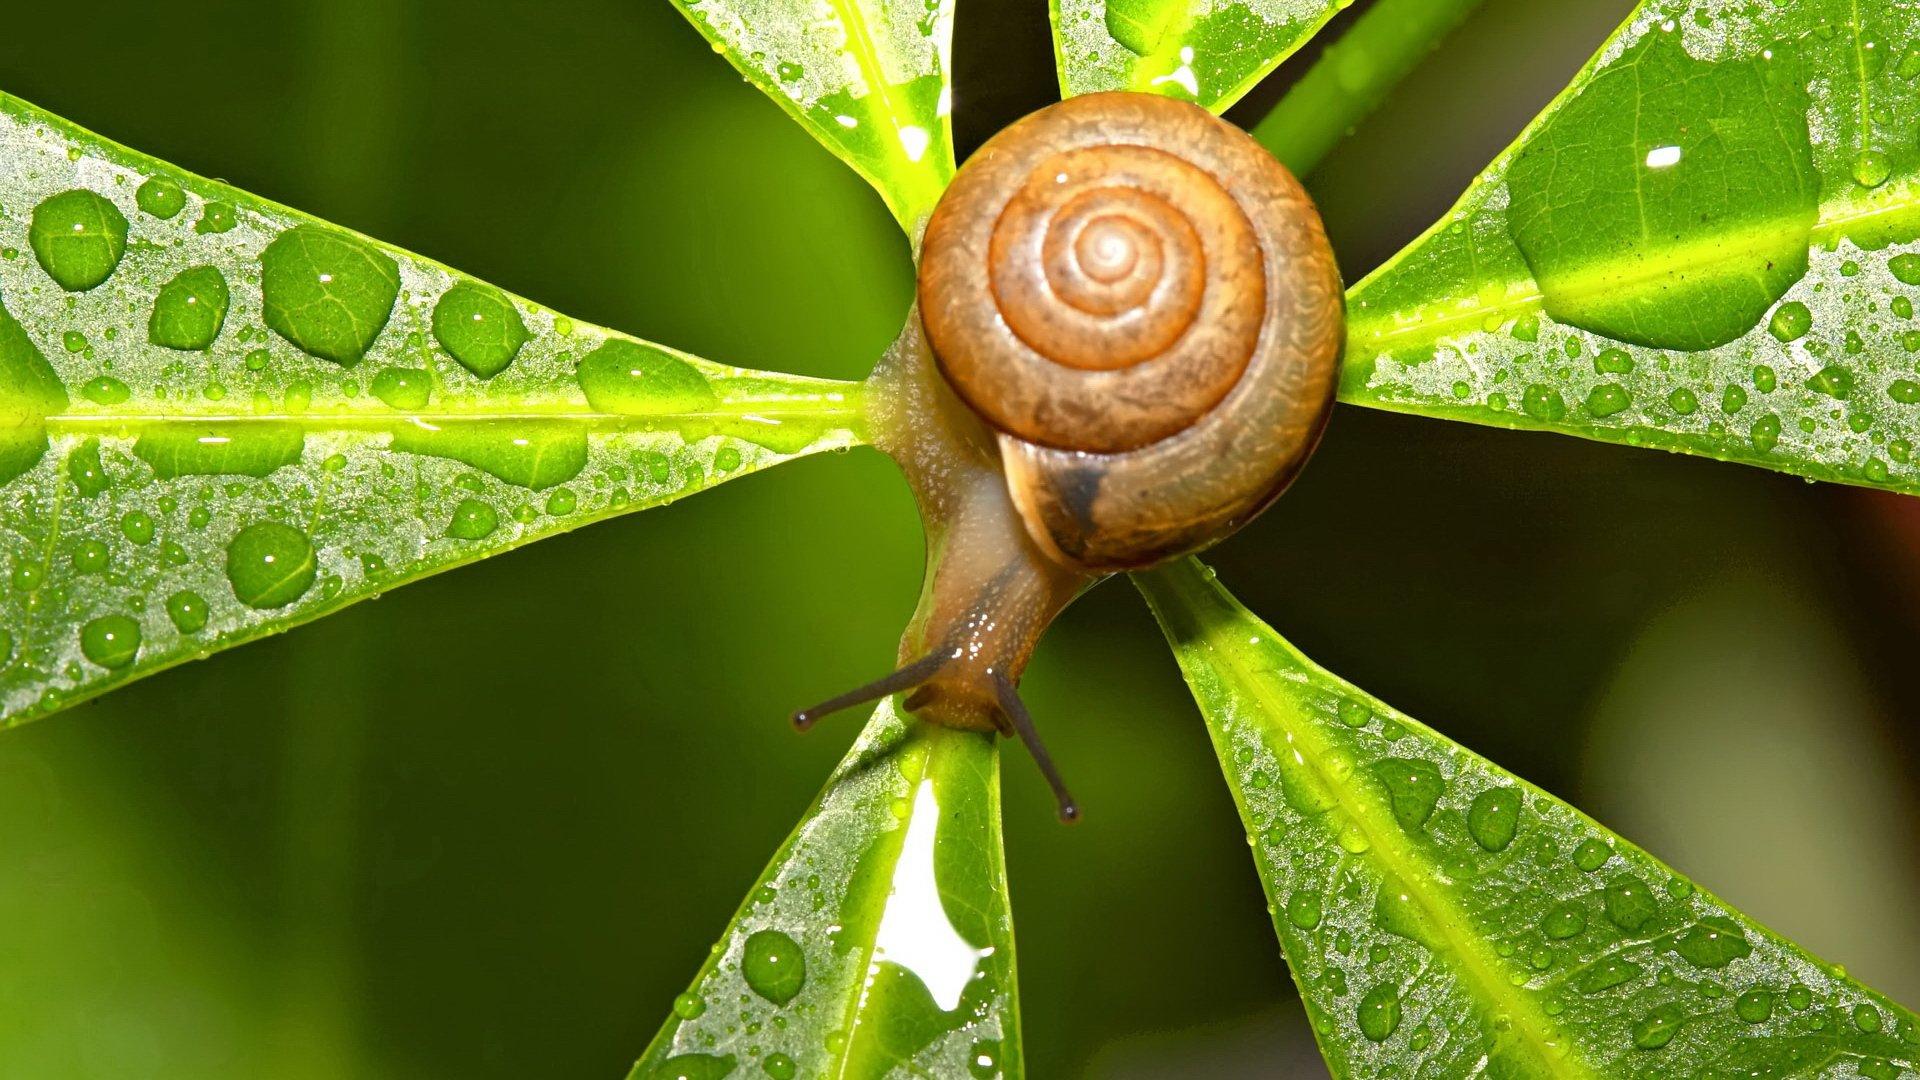 snail-leaf-wallpaper.jpg